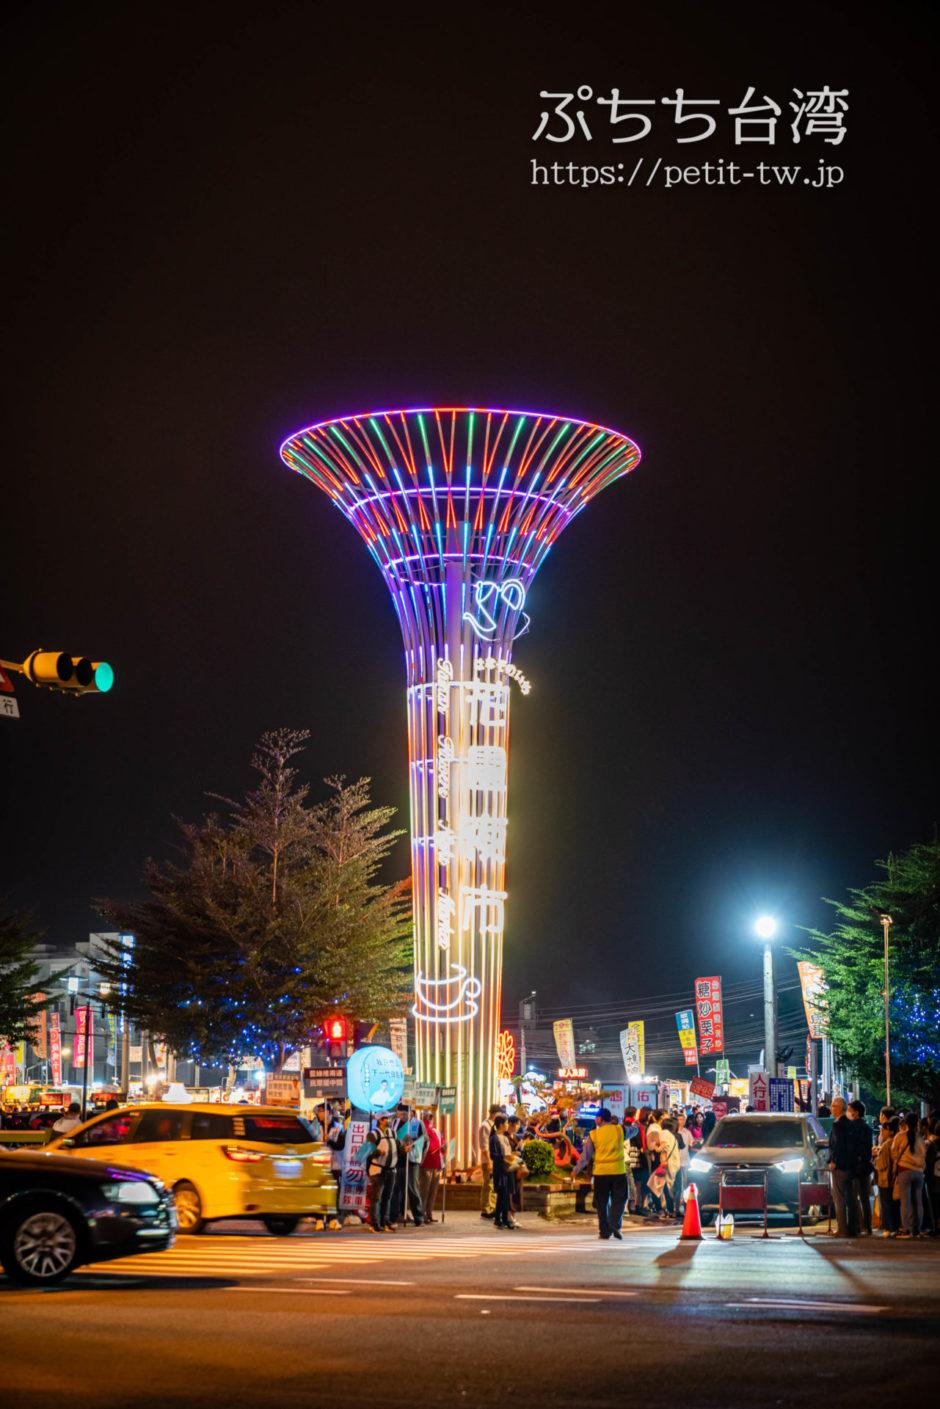 台南の花園夜市